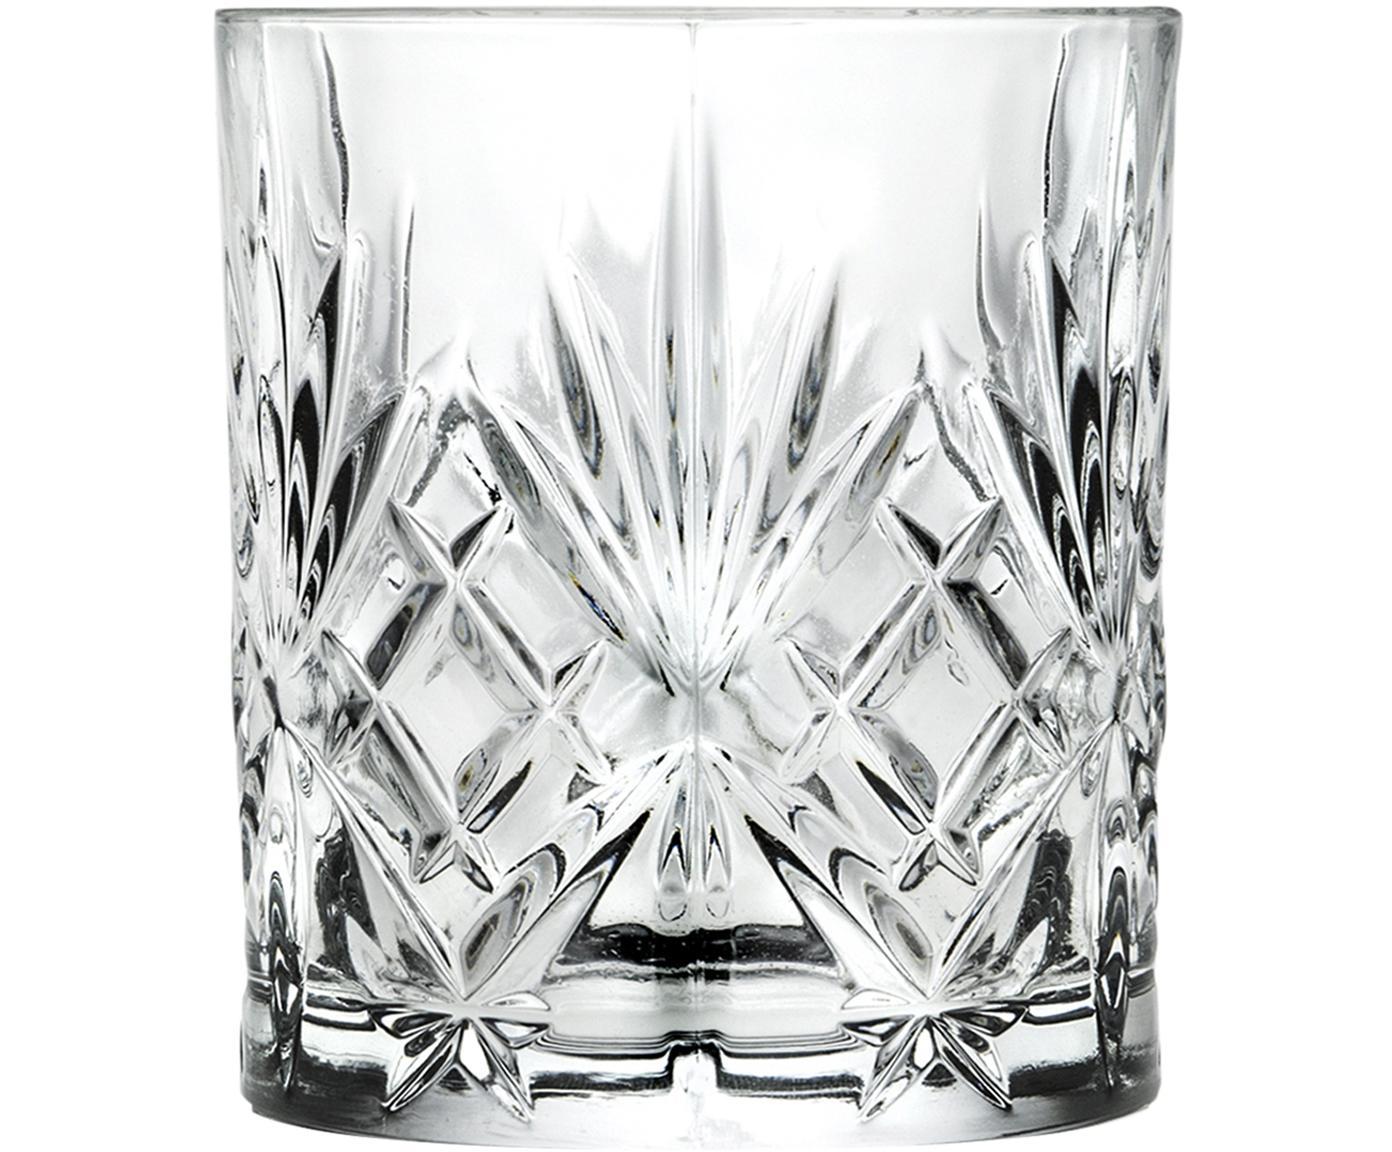 Kryształowa szklanka do whisky Melodia, 6 szt., Szkło kryształowe, Transparentny, Ø 8 x W 9 cm